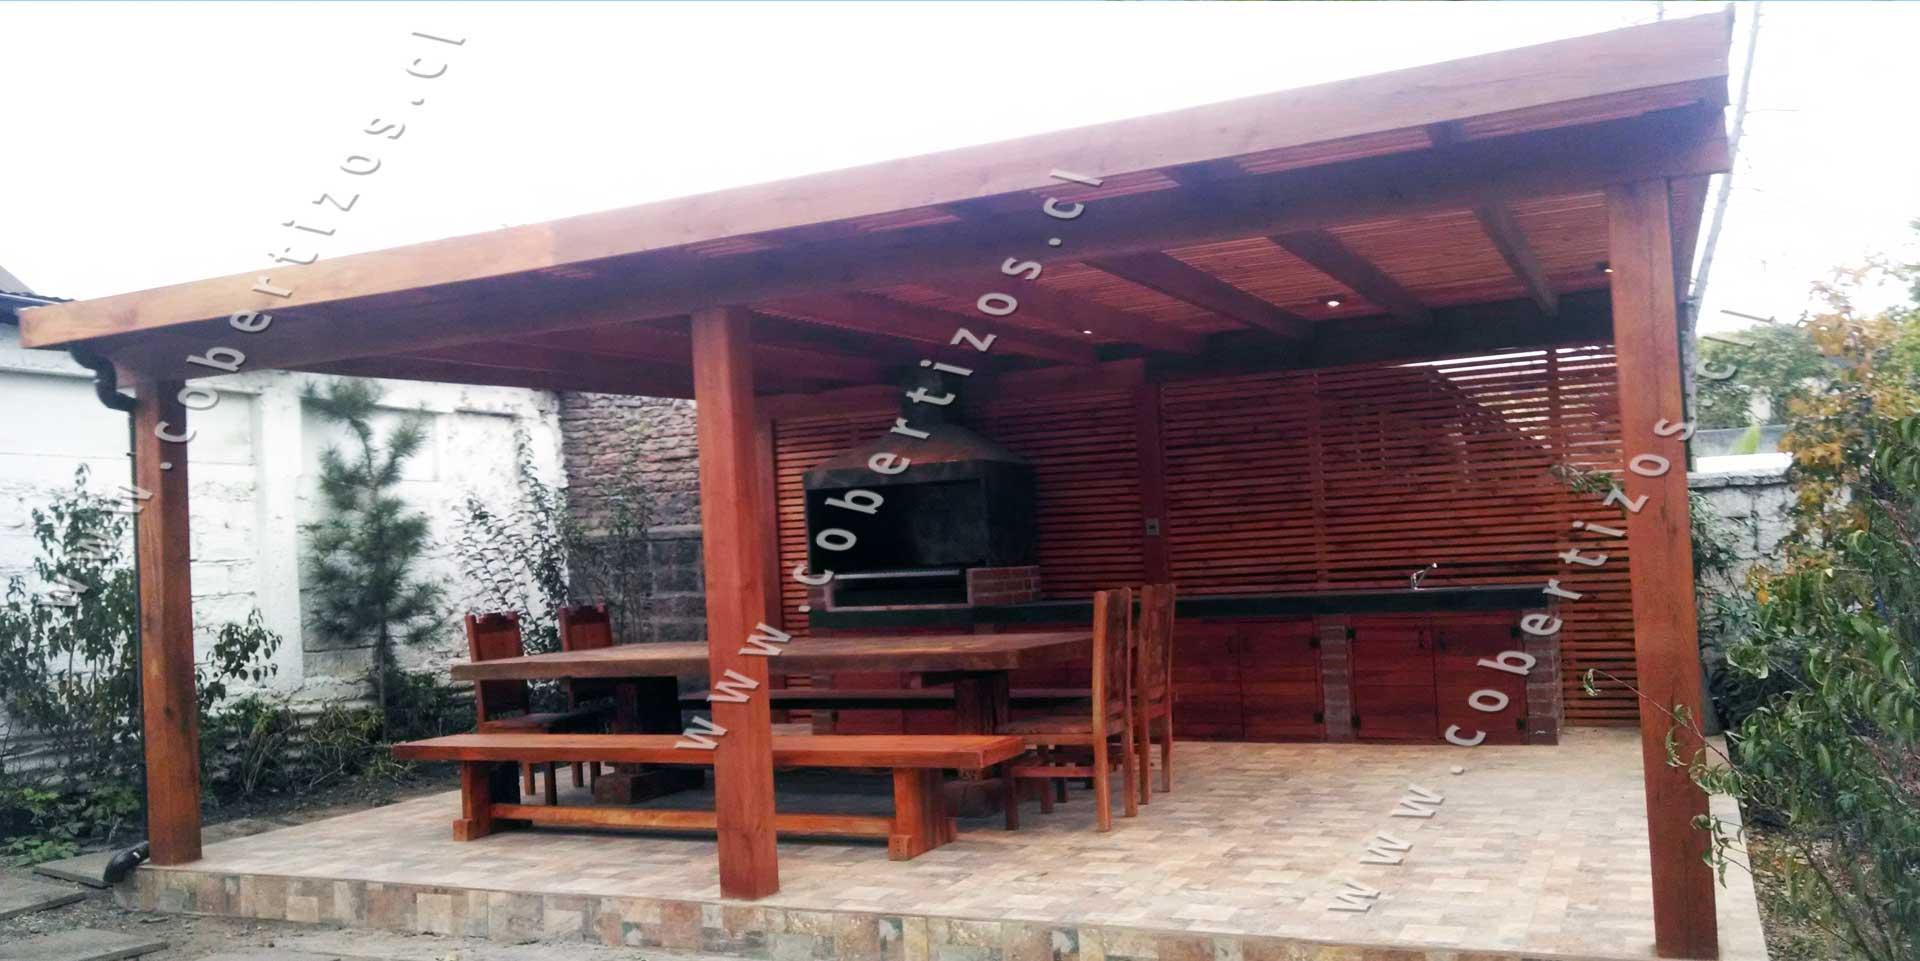 Pergolas de madera techos de terrazas pergolas itamar - Construccion de pergolas de madera ...